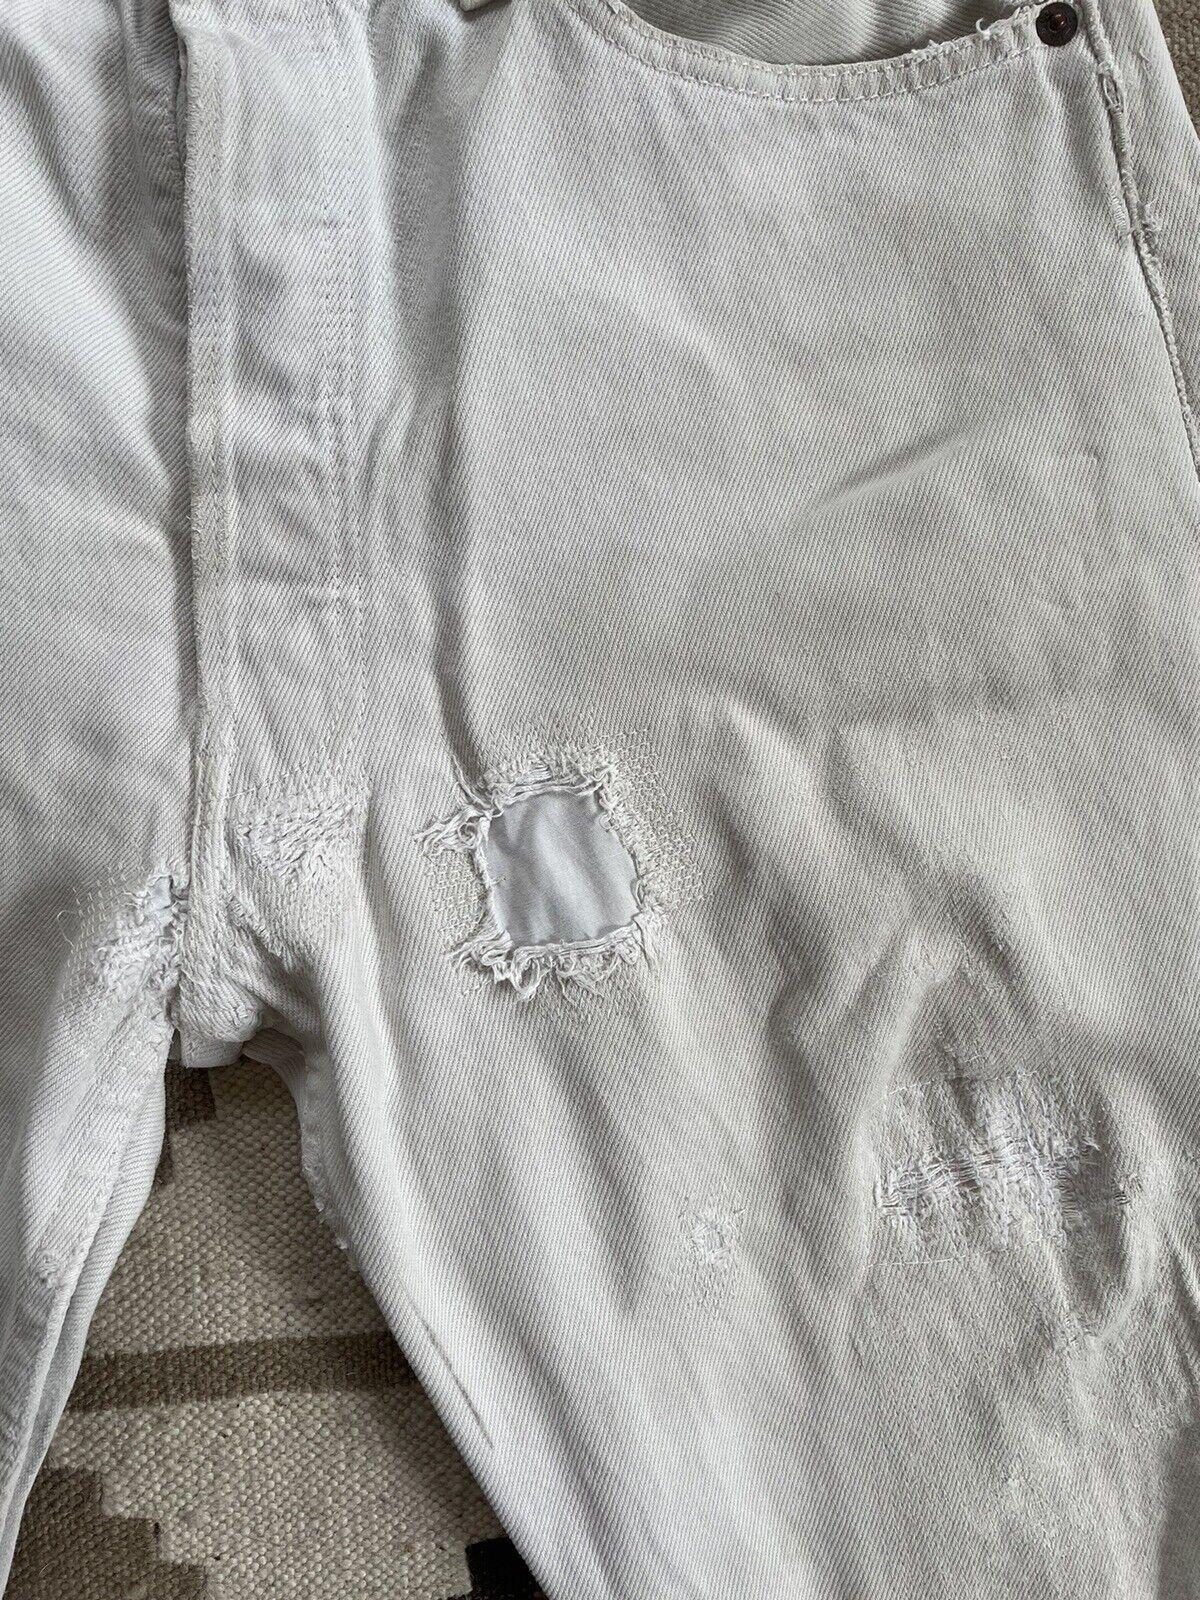 Vintage Levi's 501 Custom Distressed White Denim … - image 3